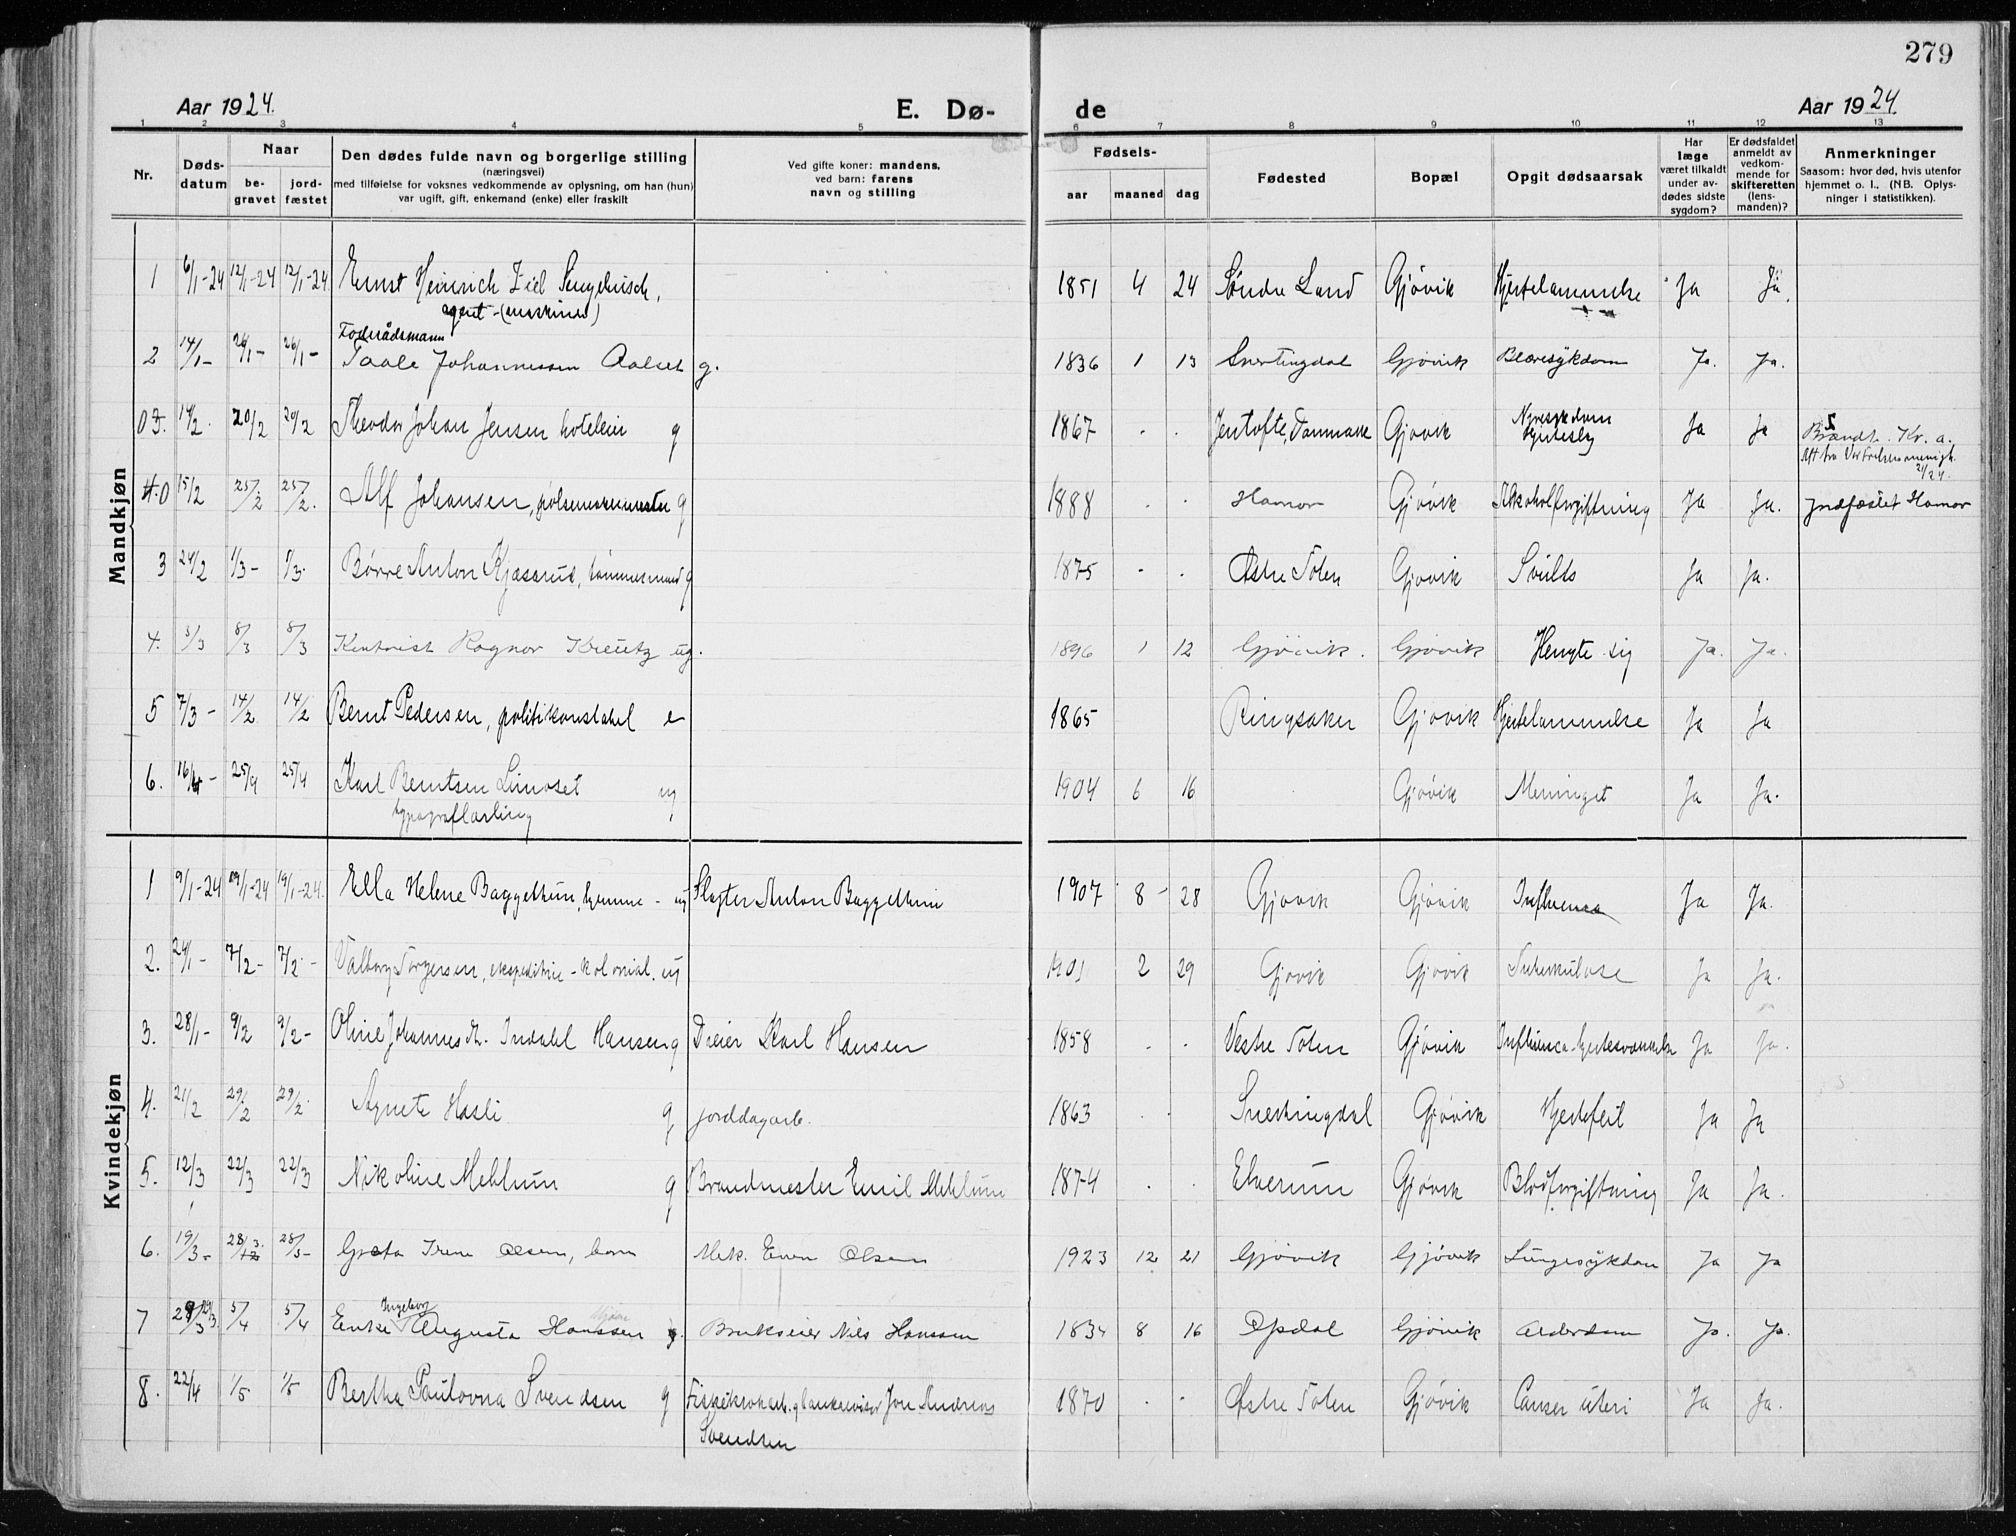 SAH, Vardal prestekontor, H/Ha/Haa/L0015: Ministerialbok nr. 15, 1923-1937, s. 279